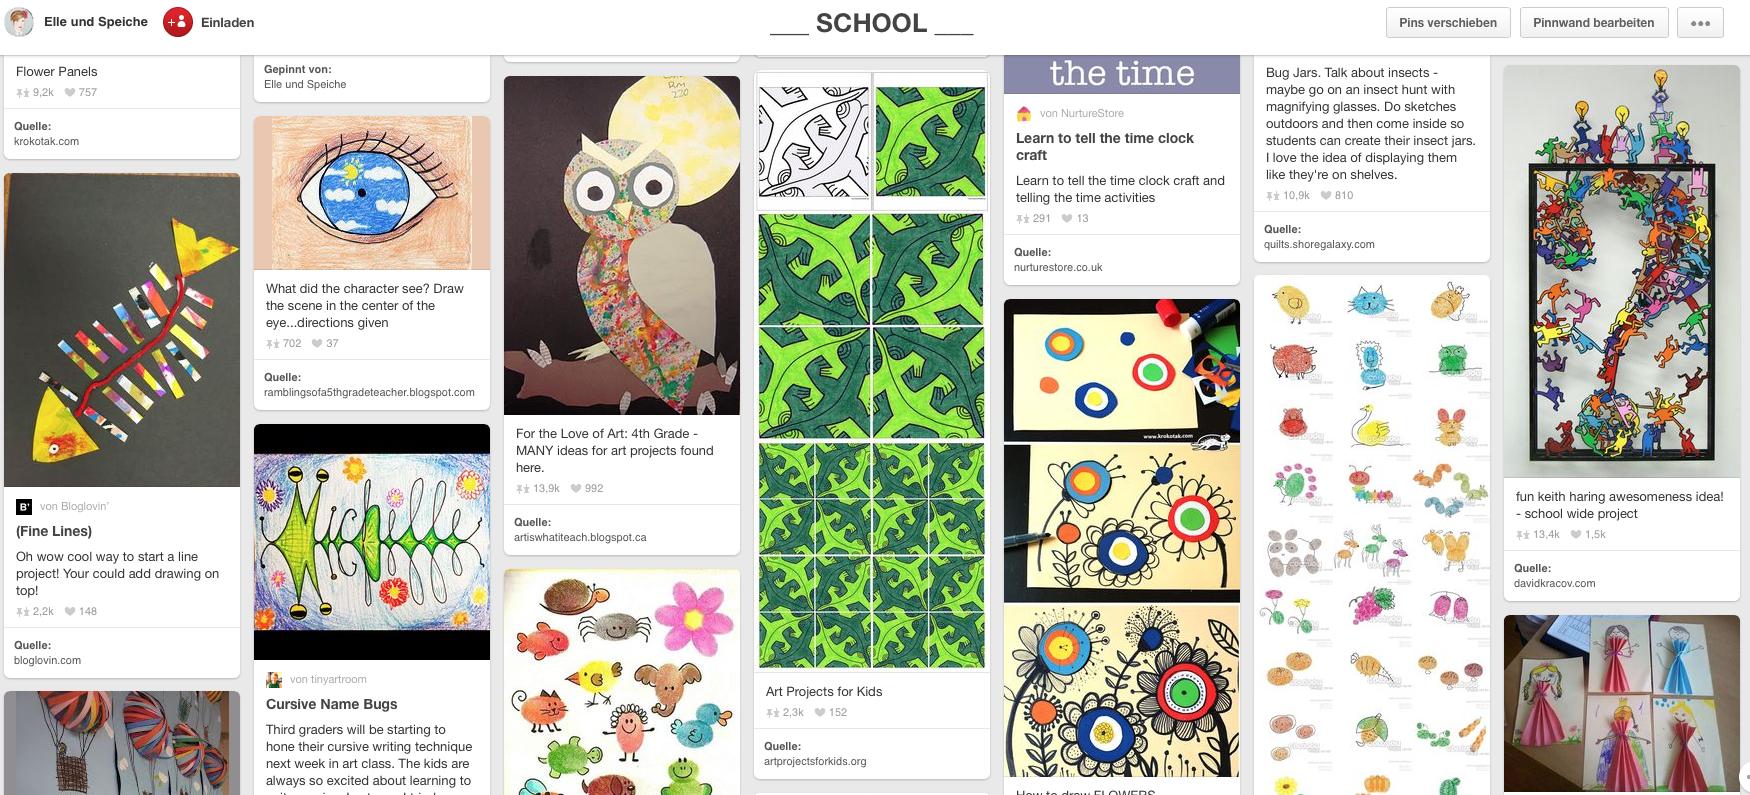 pinterest school ideas